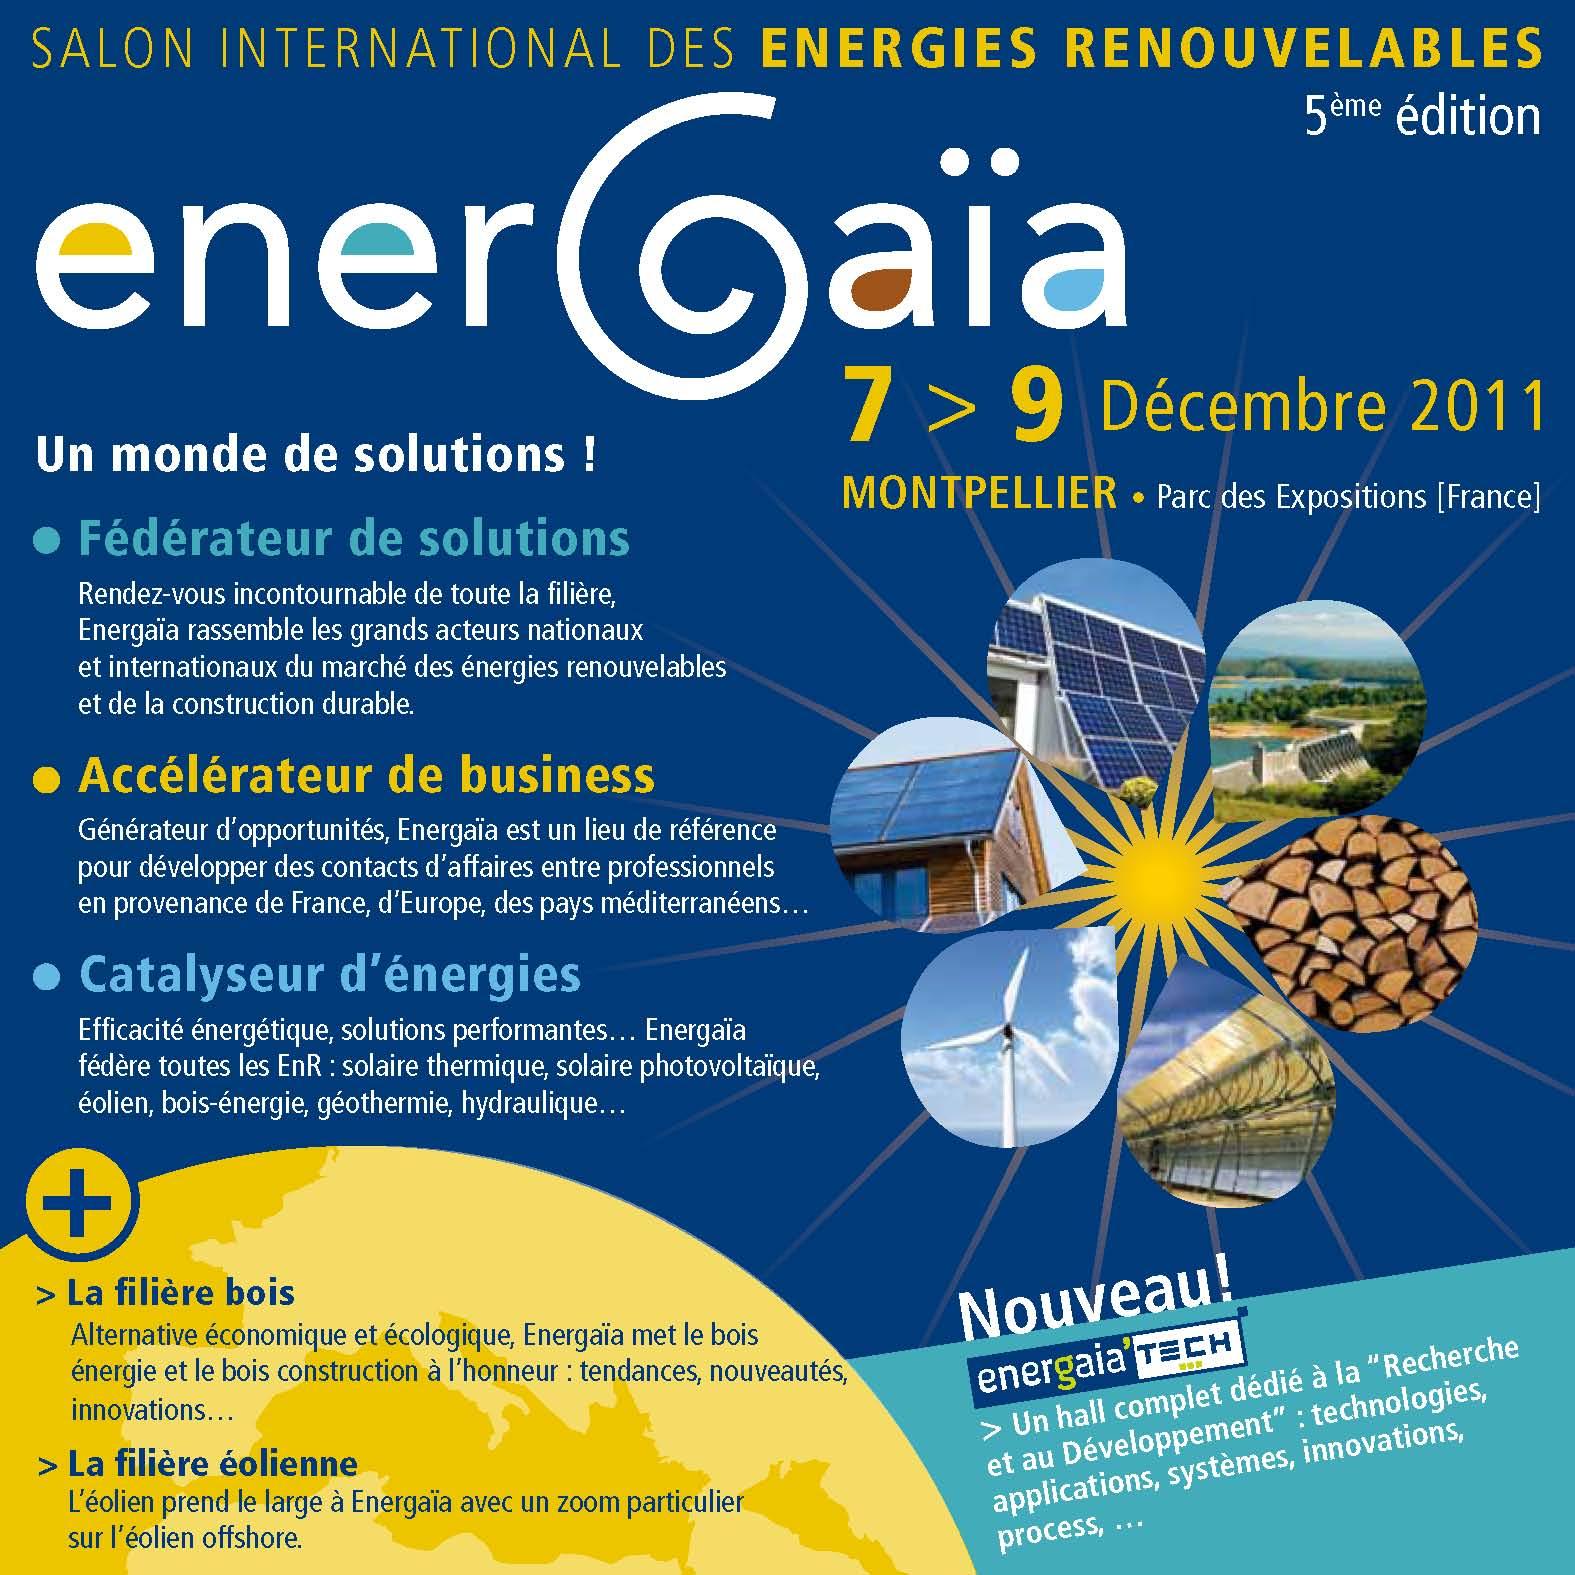 Bois energie 66 newsletter novembre 2011 for Salon energie renouvelable